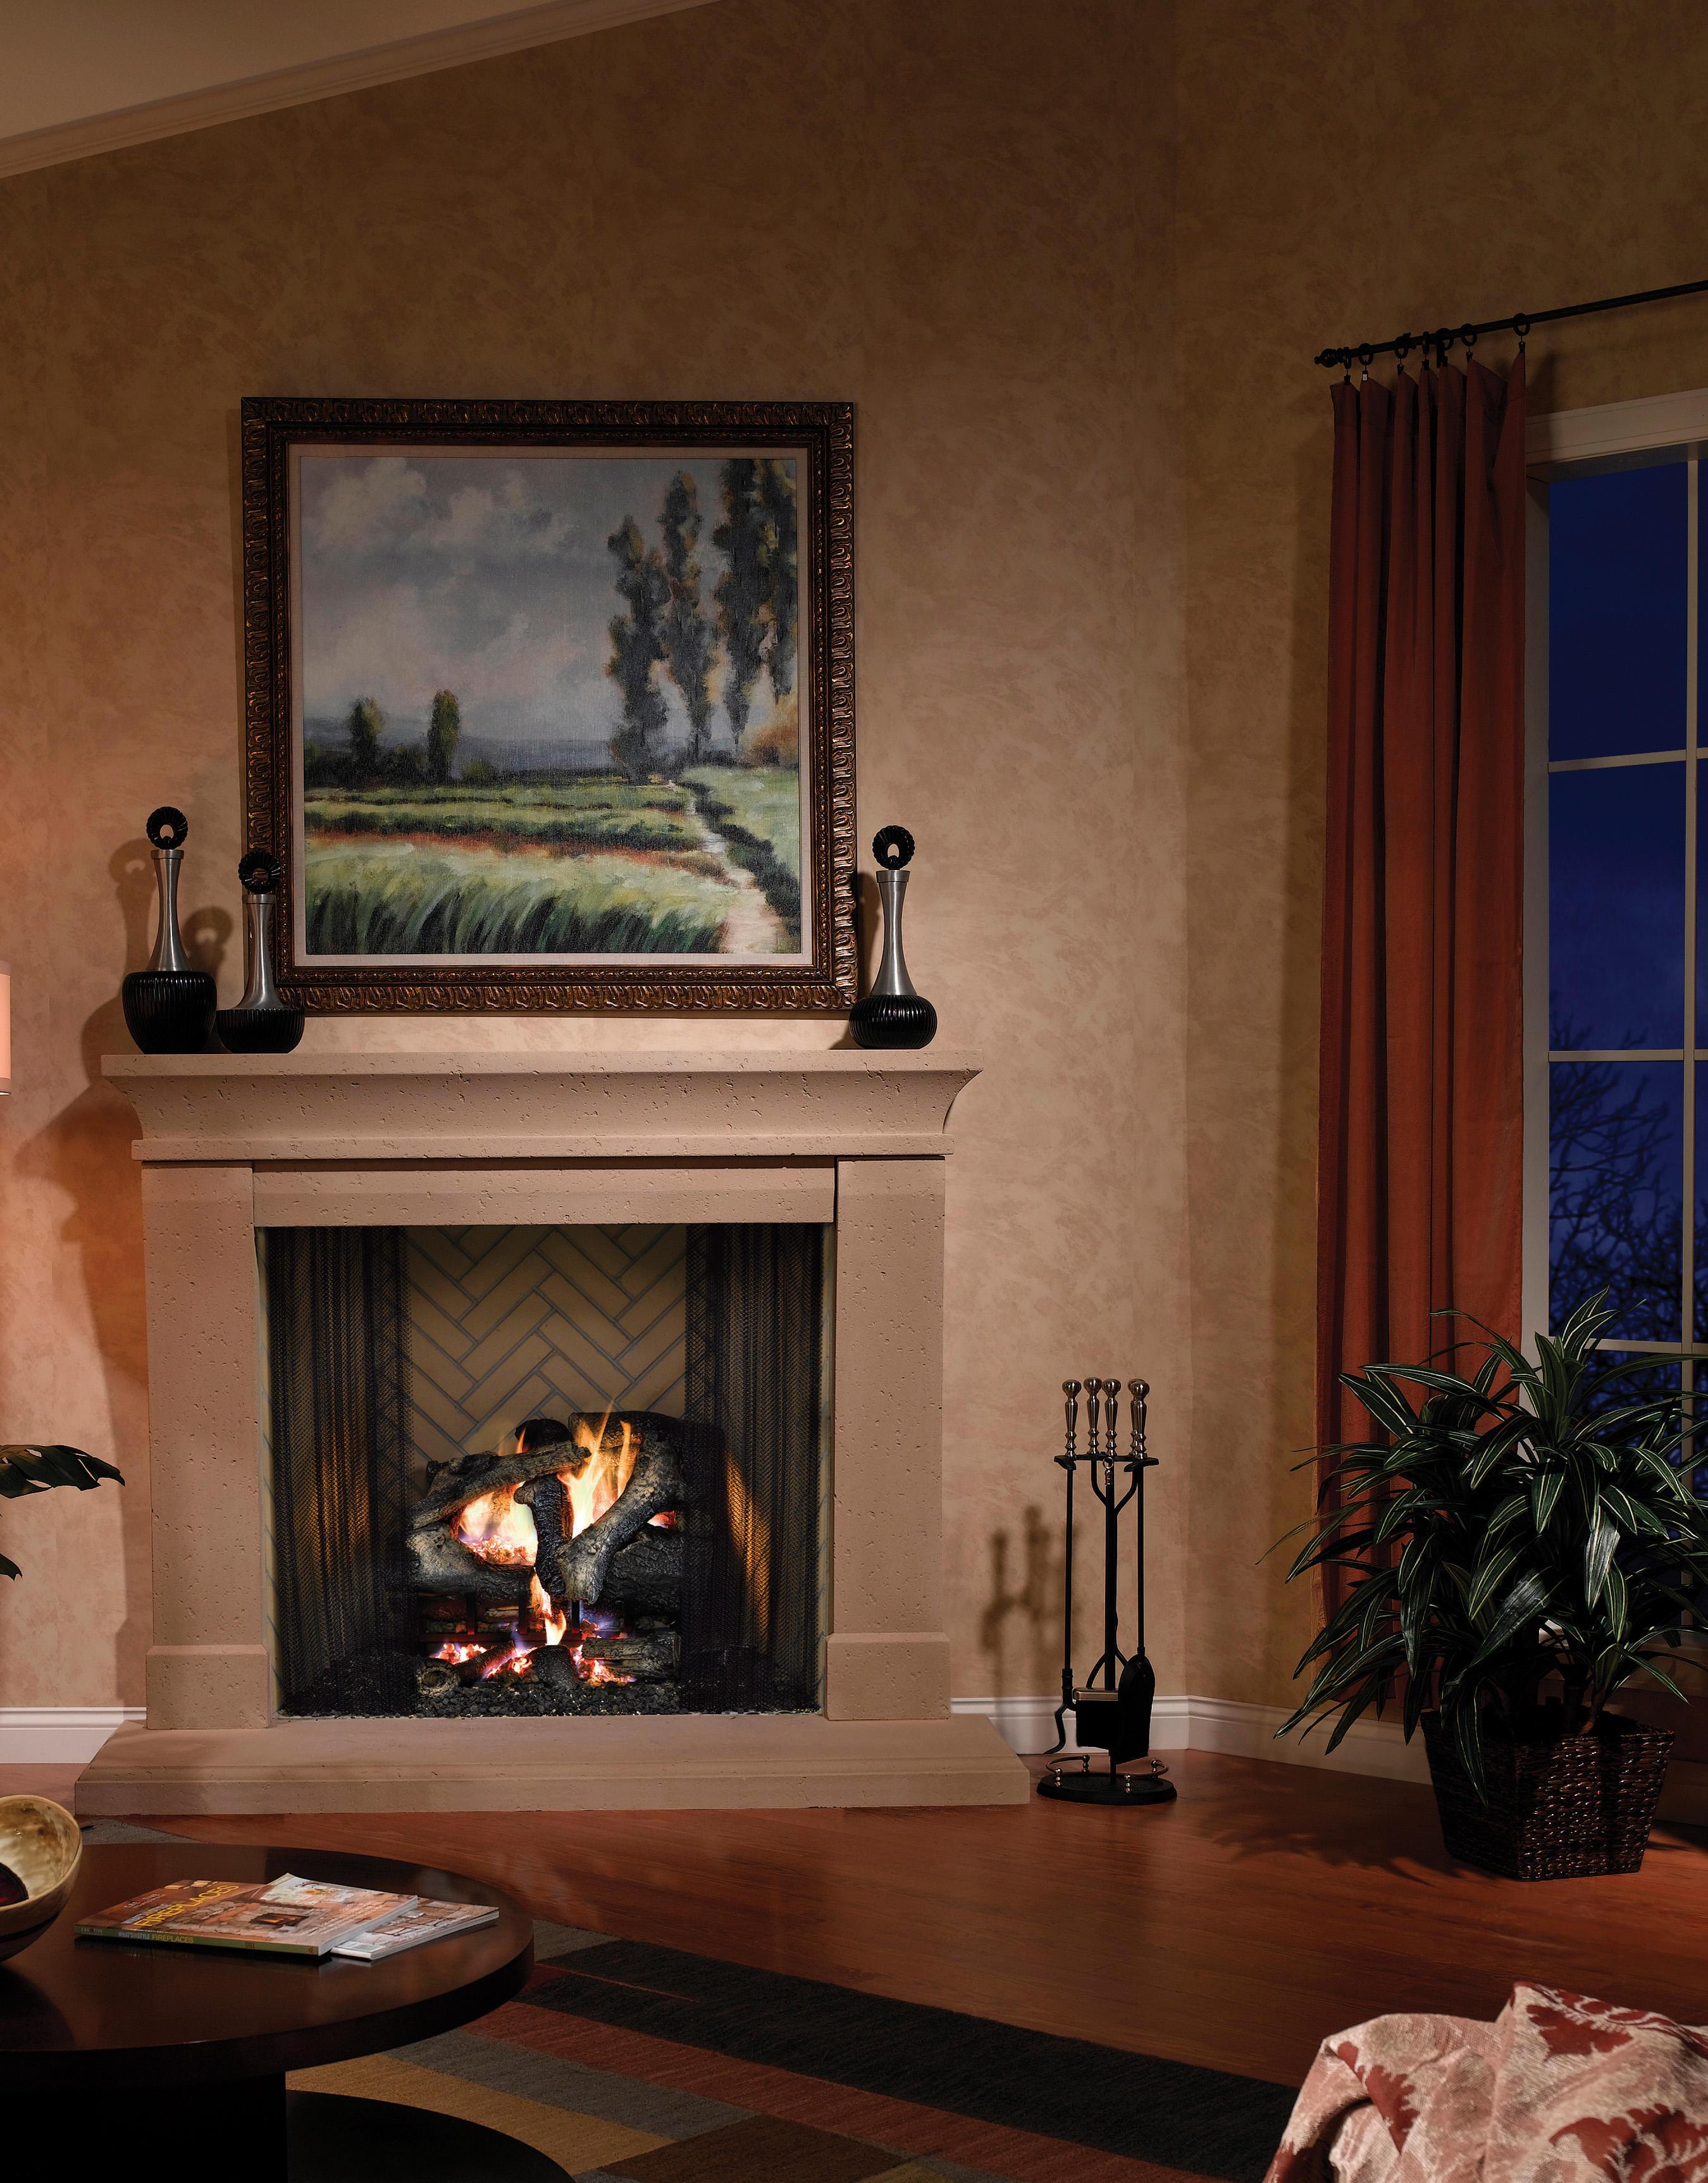 Fireside Hearth & Home image 5